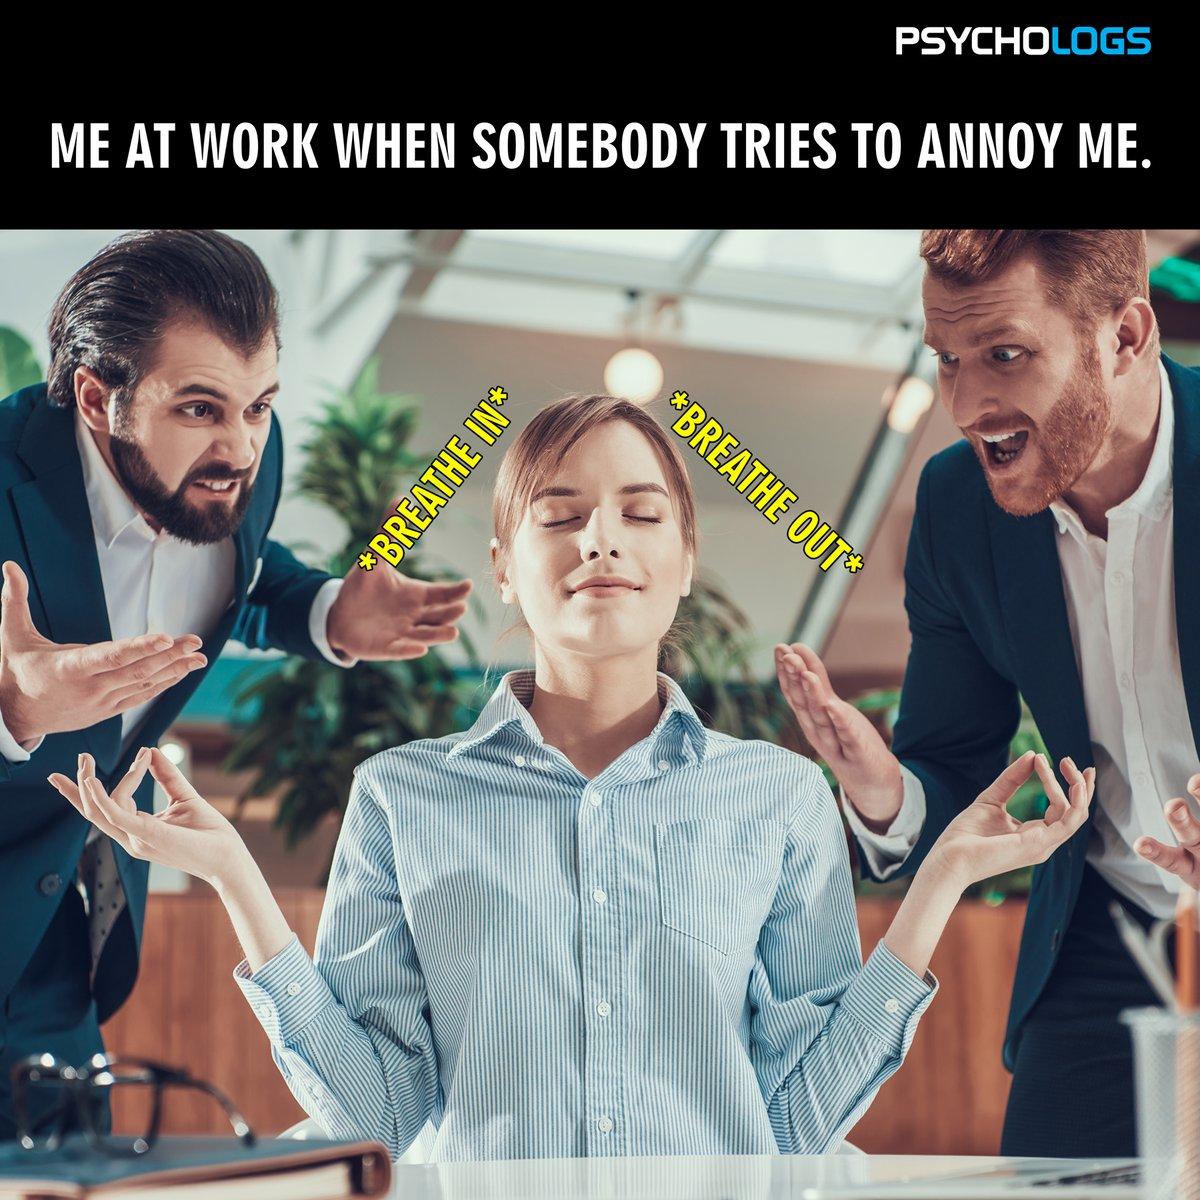 Power of meditation! #psychology #psychologsmagazine #power #meditation #funnymemes #funny #fun #psychologymemes #annoy #annoying #breathin #breathout #work #worklife #people #lifeatwork #workoholic #annoyme #workpressure #officelife #peopleatwork #annoyingpeoplepic.twitter.com/cK7FPSr3Zg